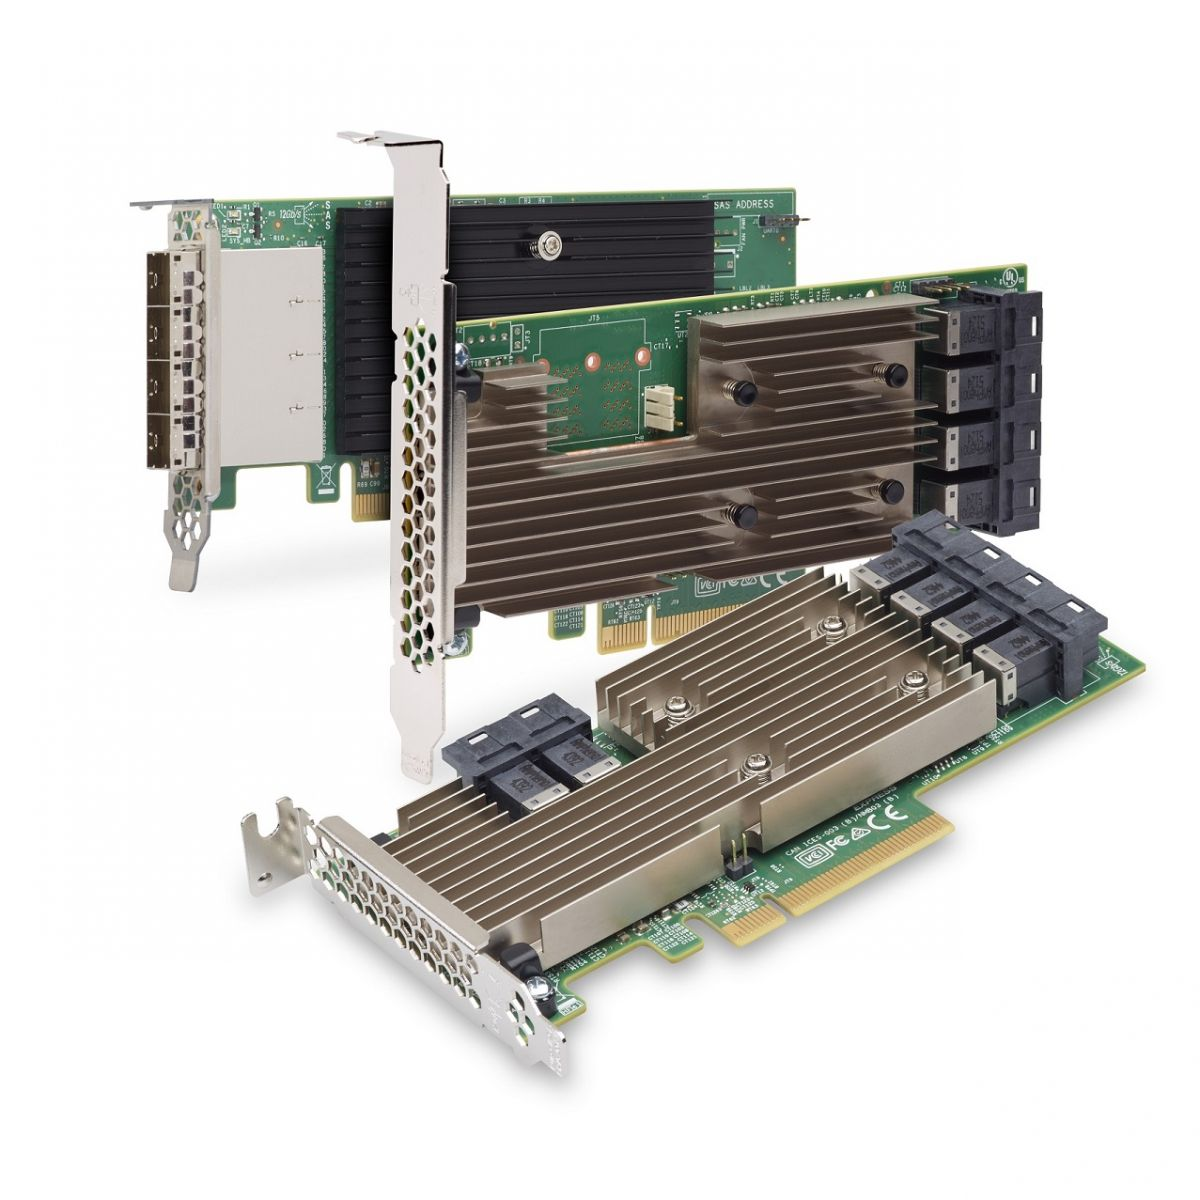 Broadcom 9305 12Gb/s HBA series